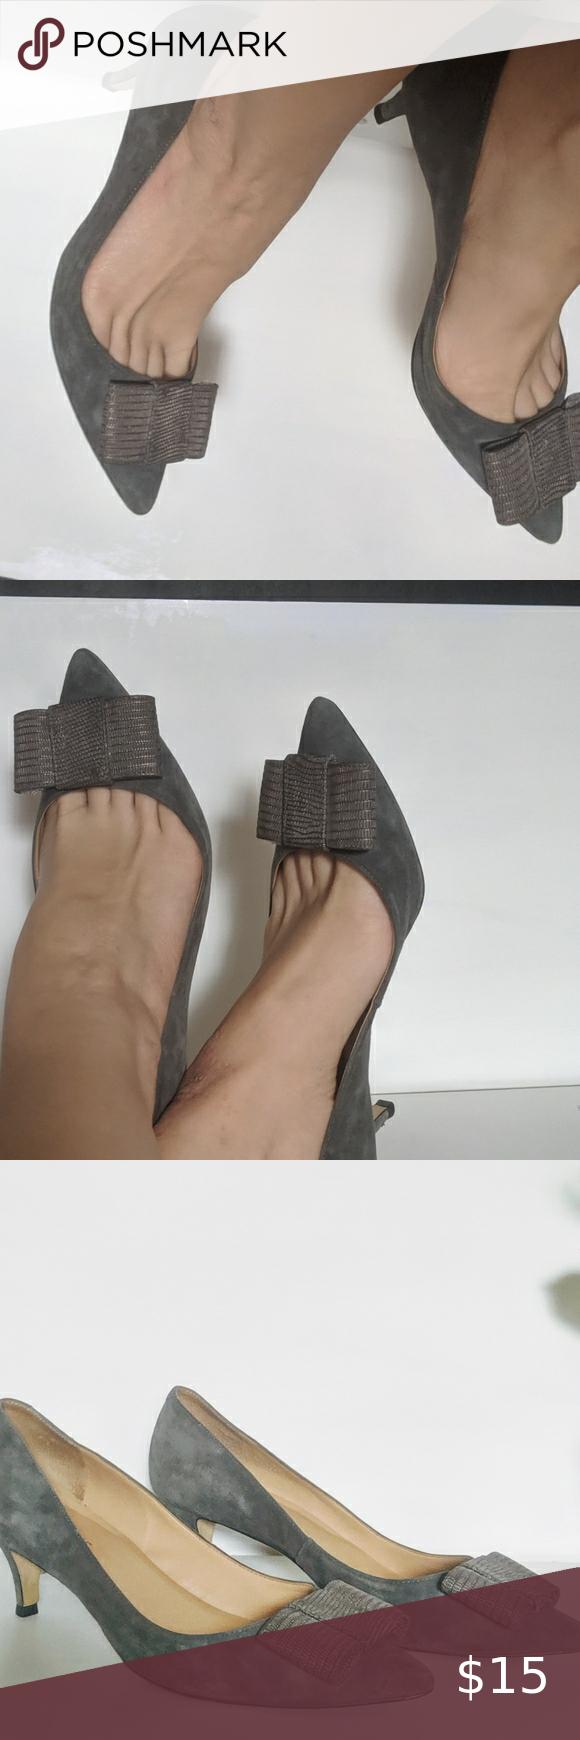 Gray suede kitten heels 8.5 (wide) in